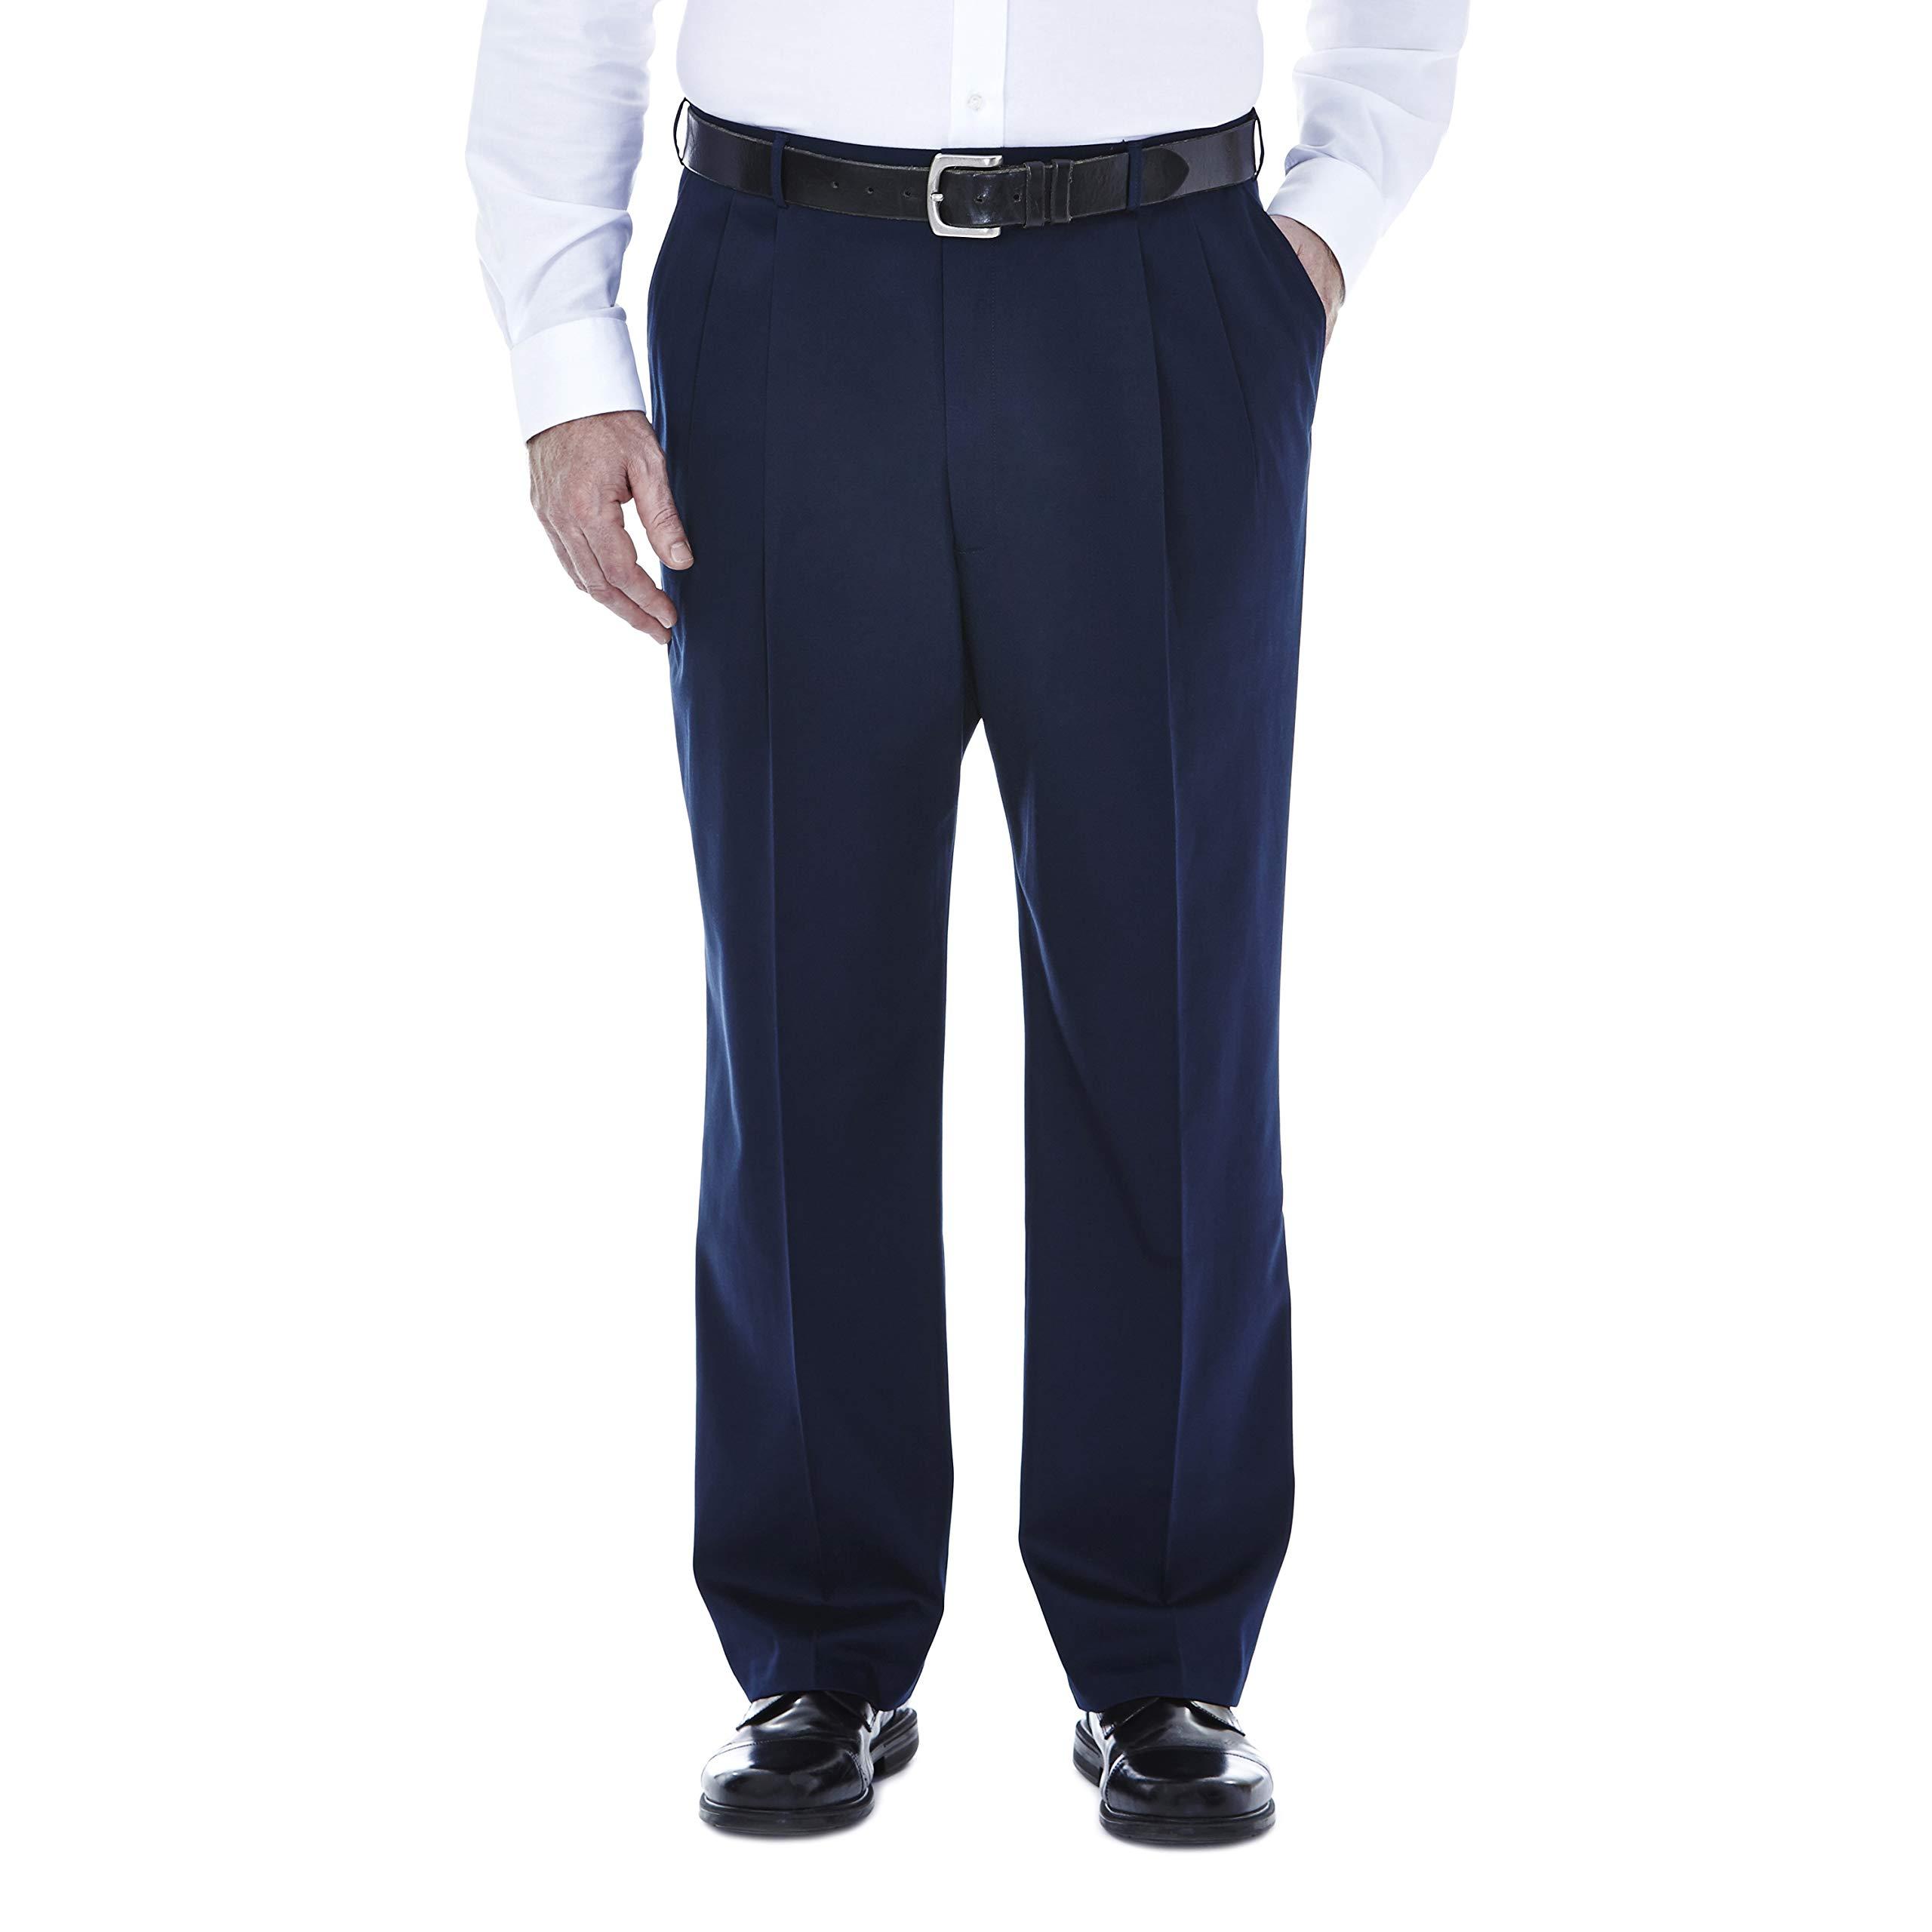 Haggar Men's Big-Tall Premium No Iron Classic Fit Pleat Front Pant, Dark Navy, 48x30